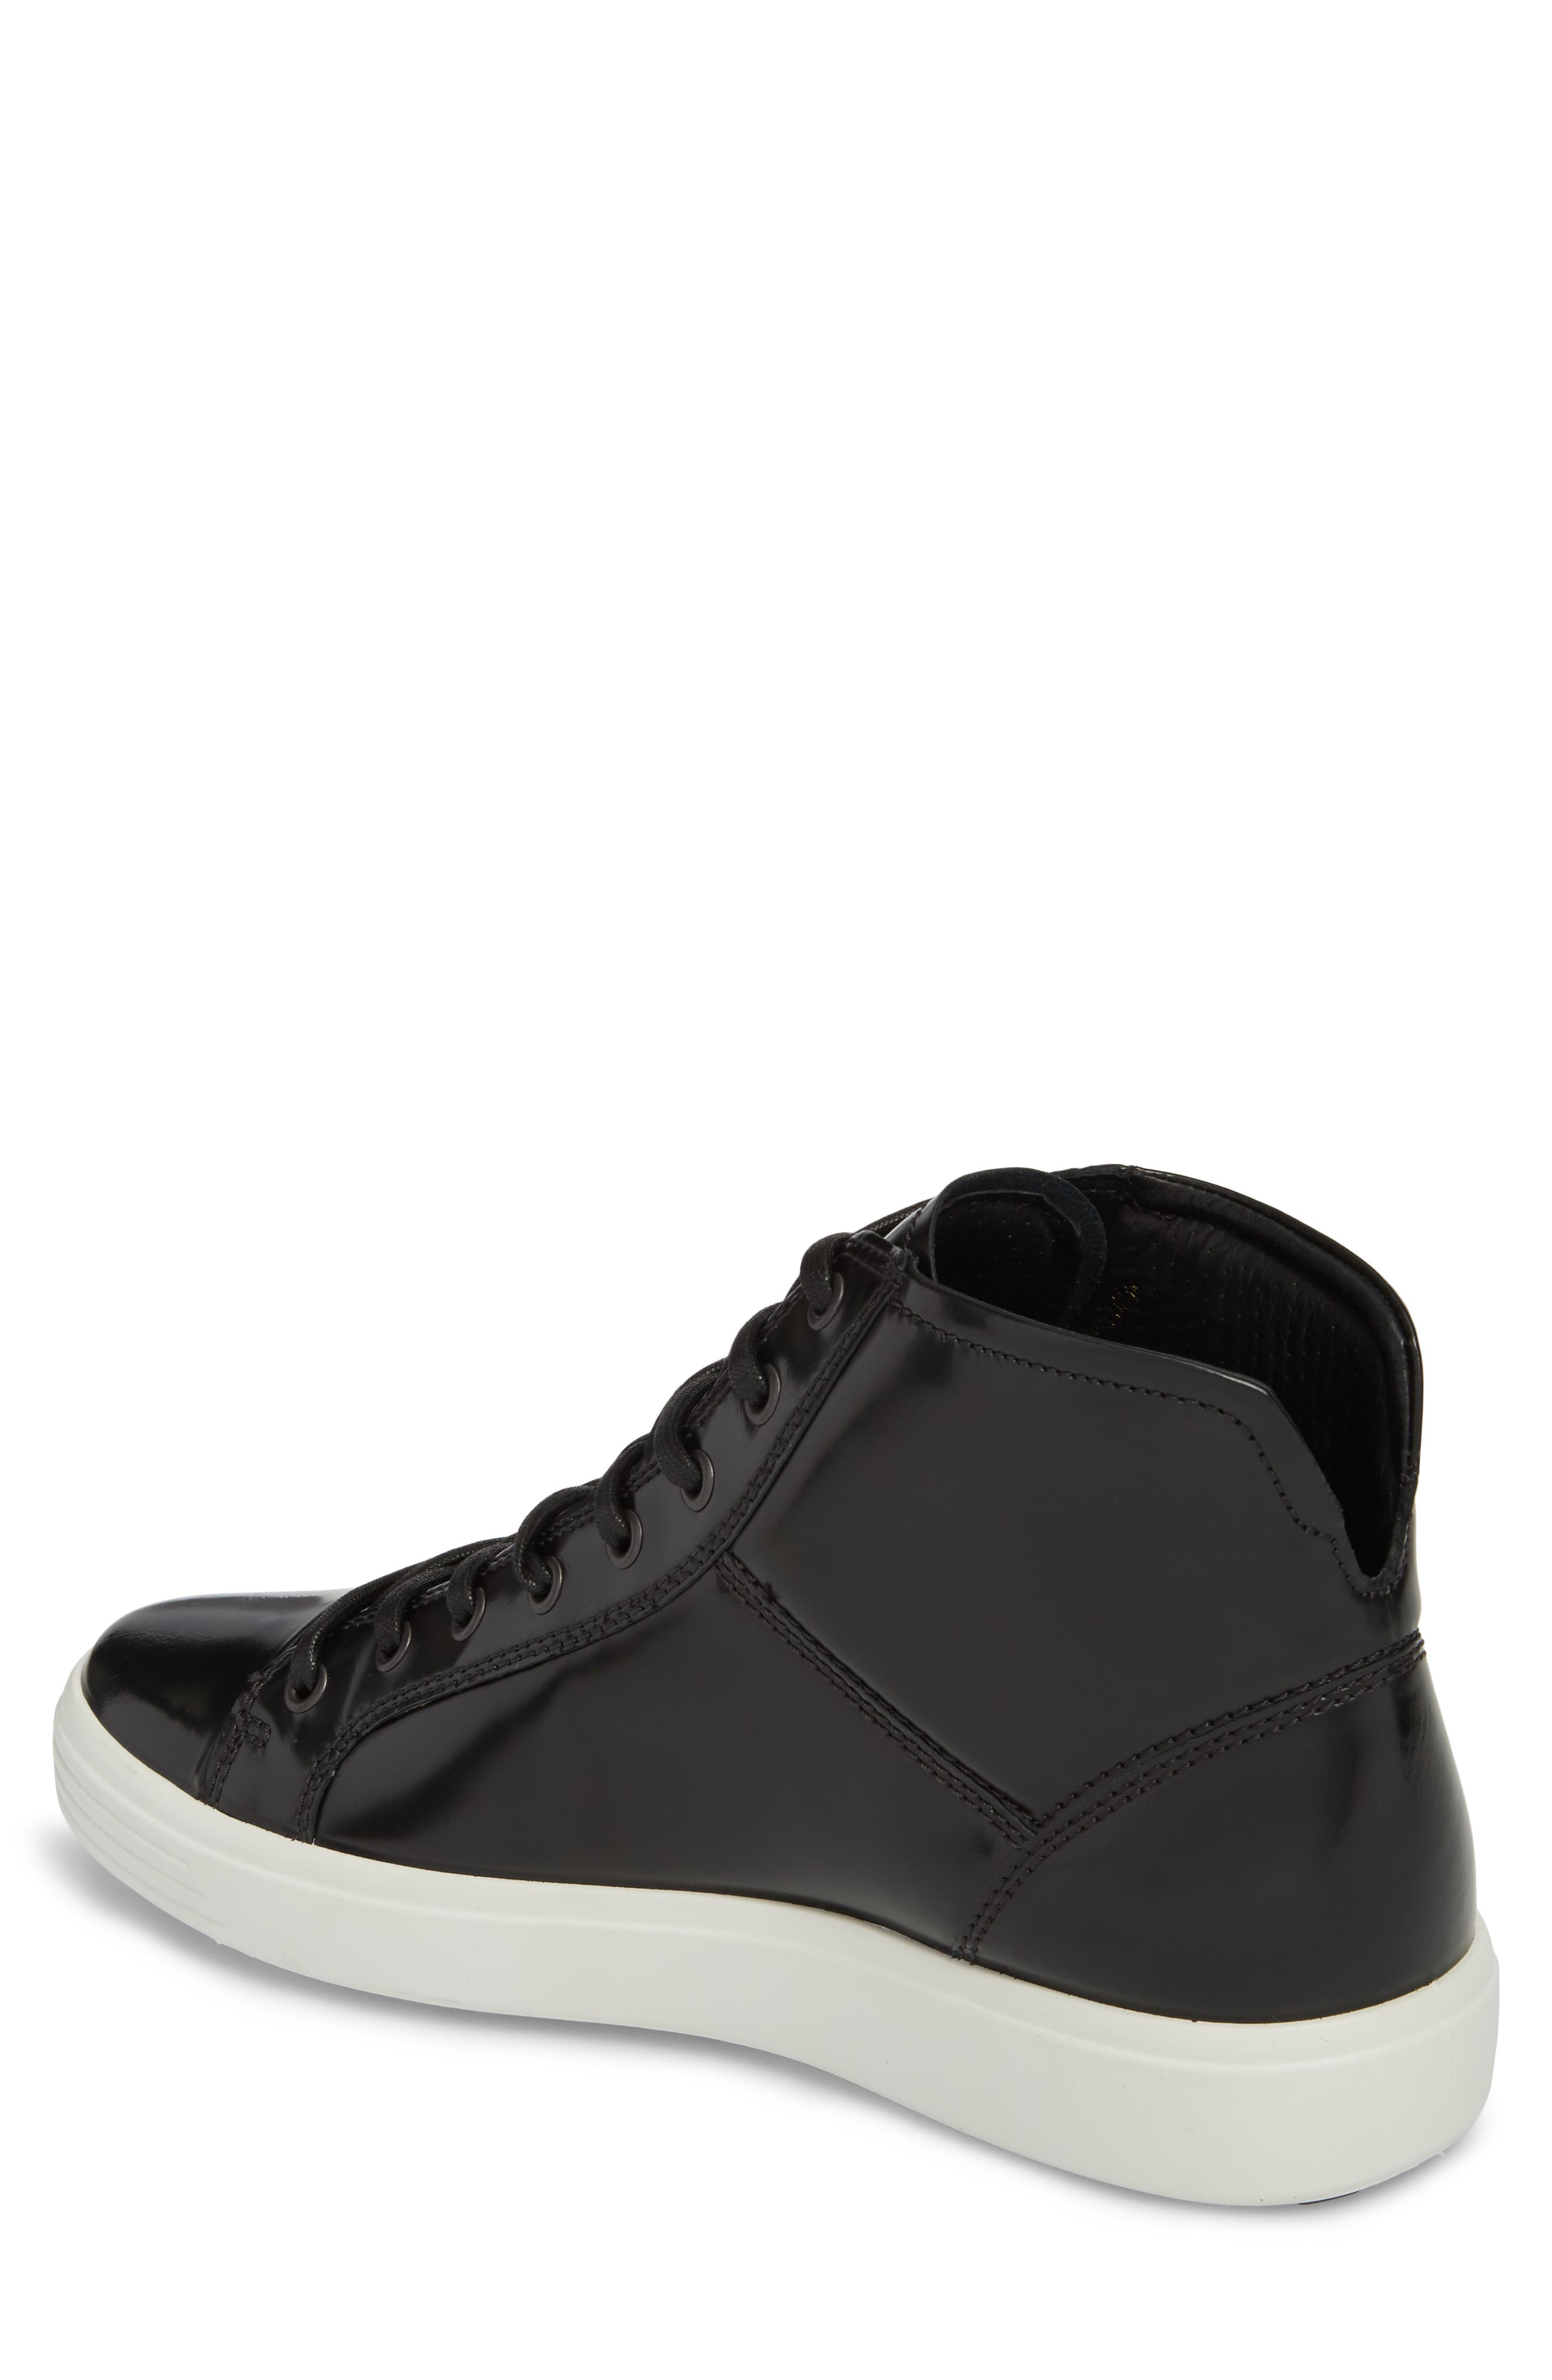 Soft 7 Premium High Top Sneaker,                             Alternate thumbnail 2, color,                             Black Leather